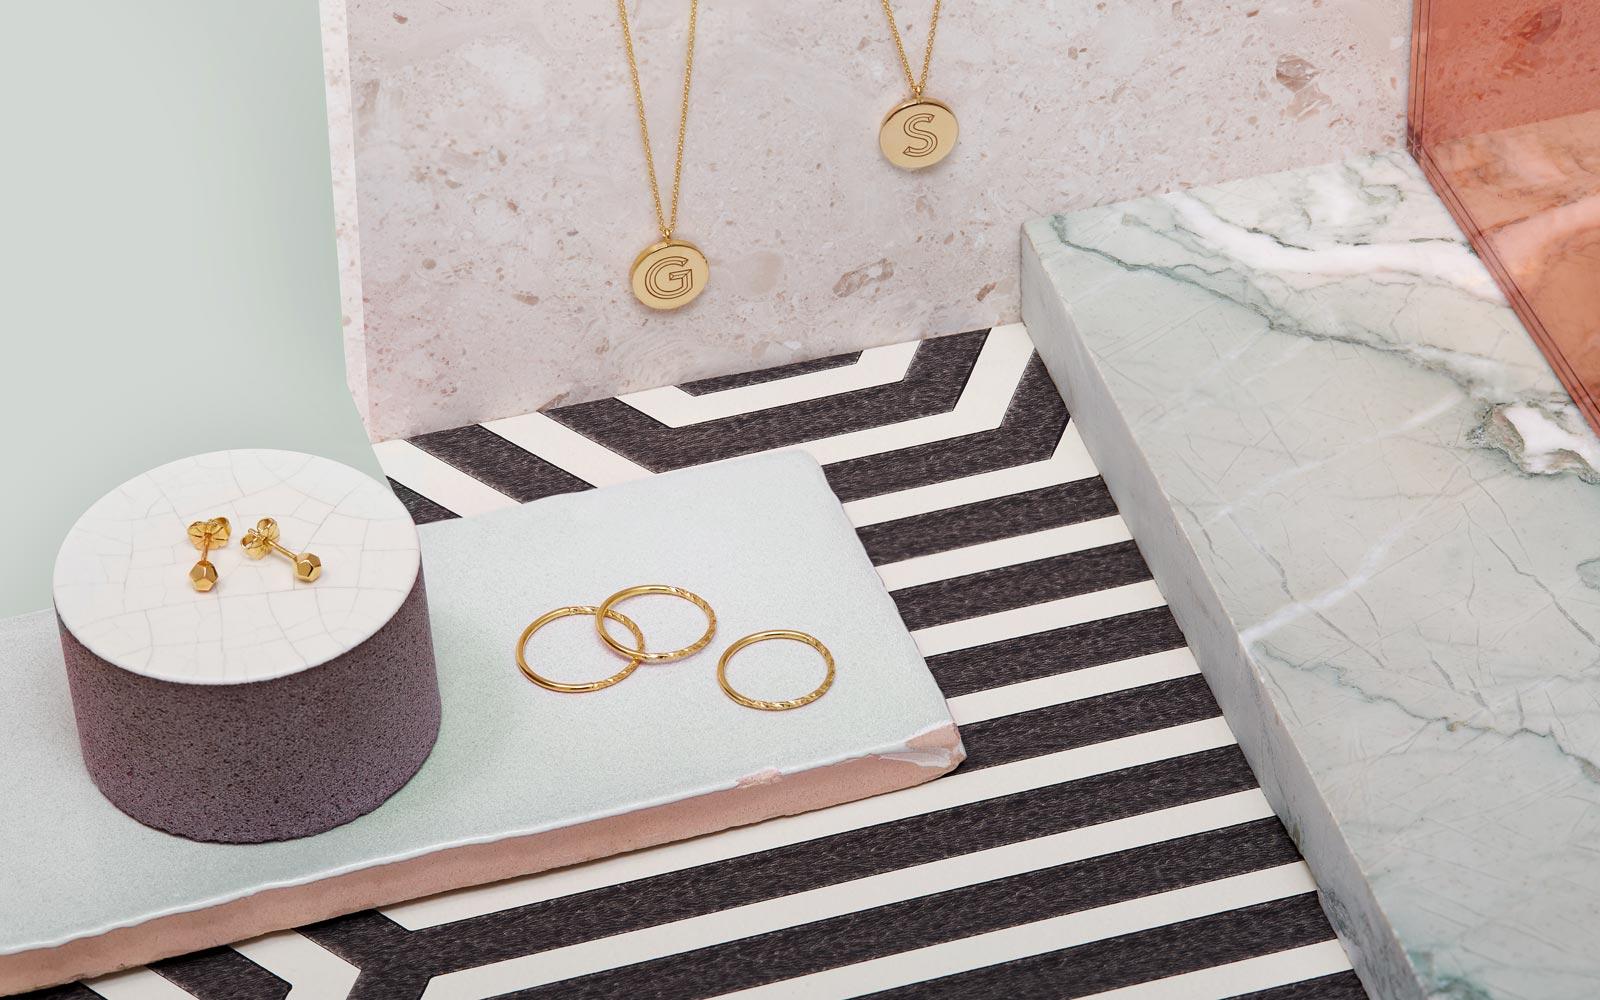 FI-myia-bonner-jewellery-02.jpg